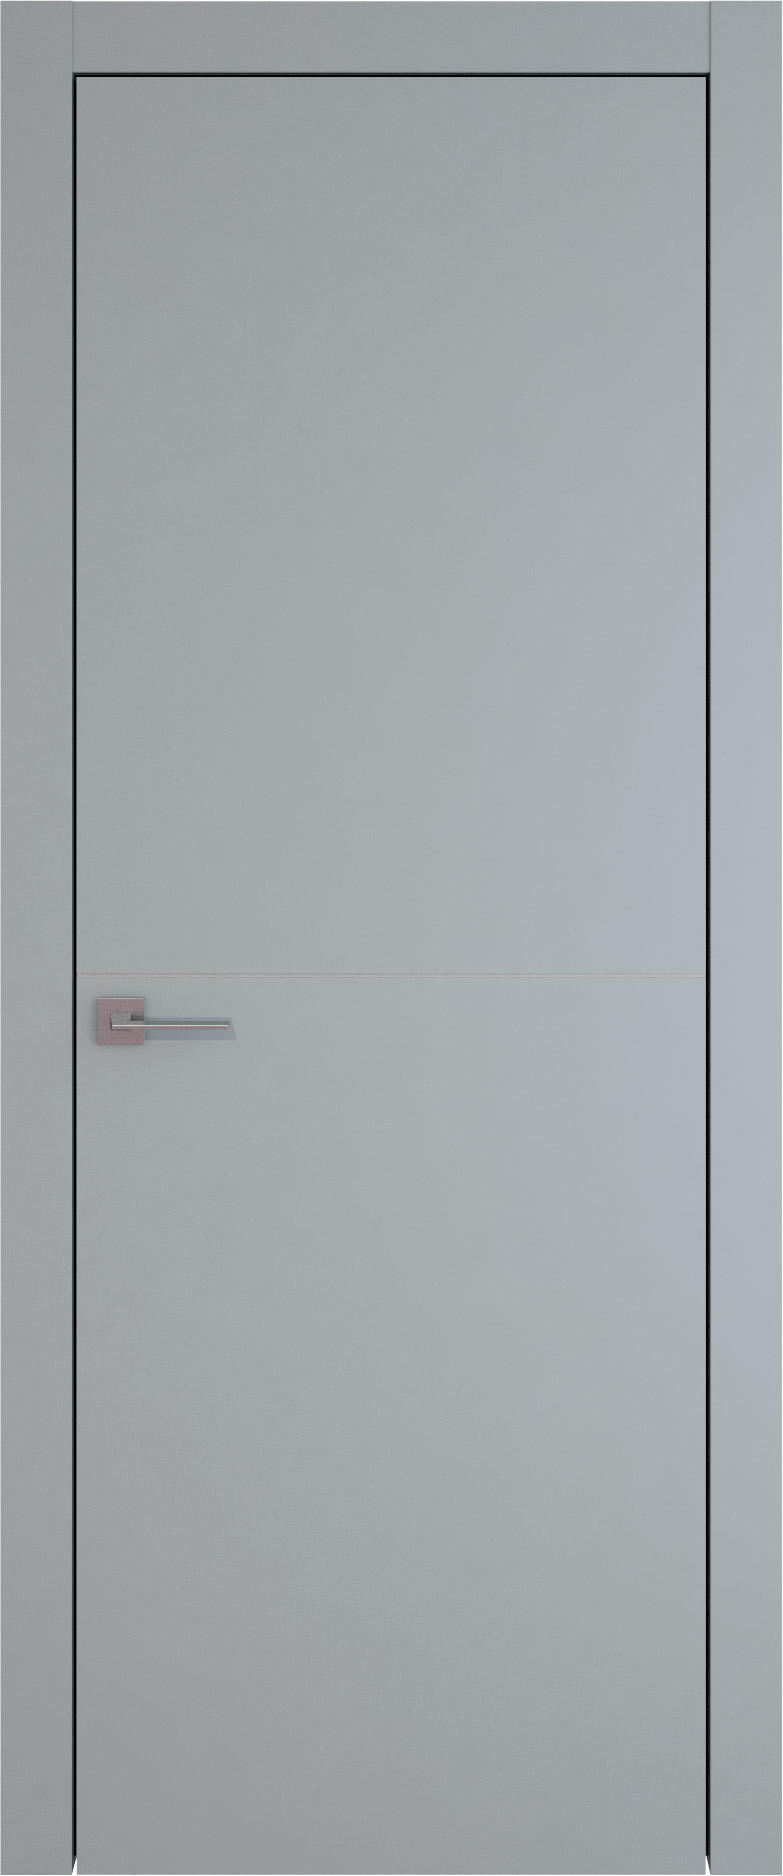 Tivoli Б-3 цвет - Серебристо-серая эмаль (RAL 7045) Без стекла (ДГ)